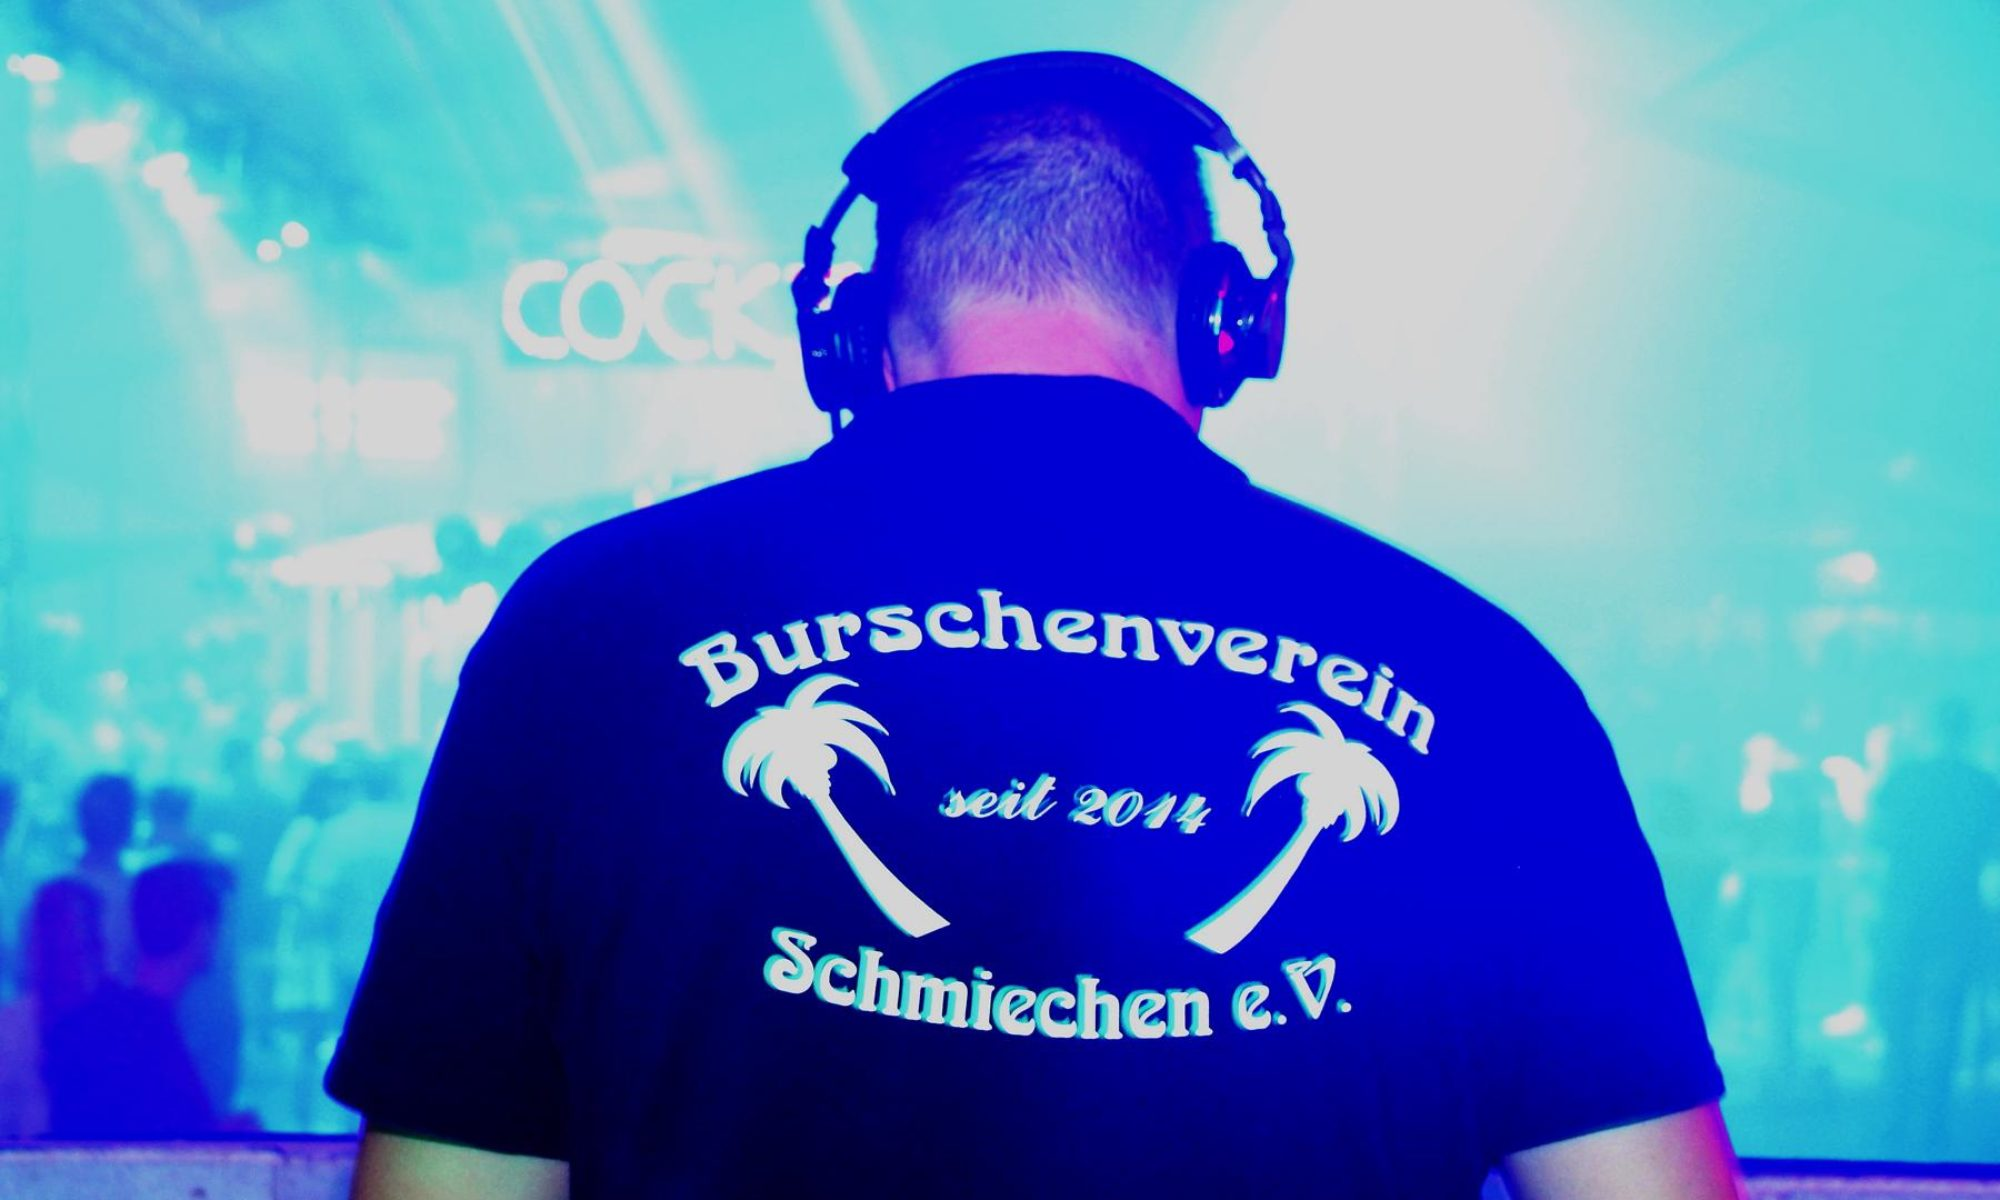 Burschenverein Schmiechen e.V.